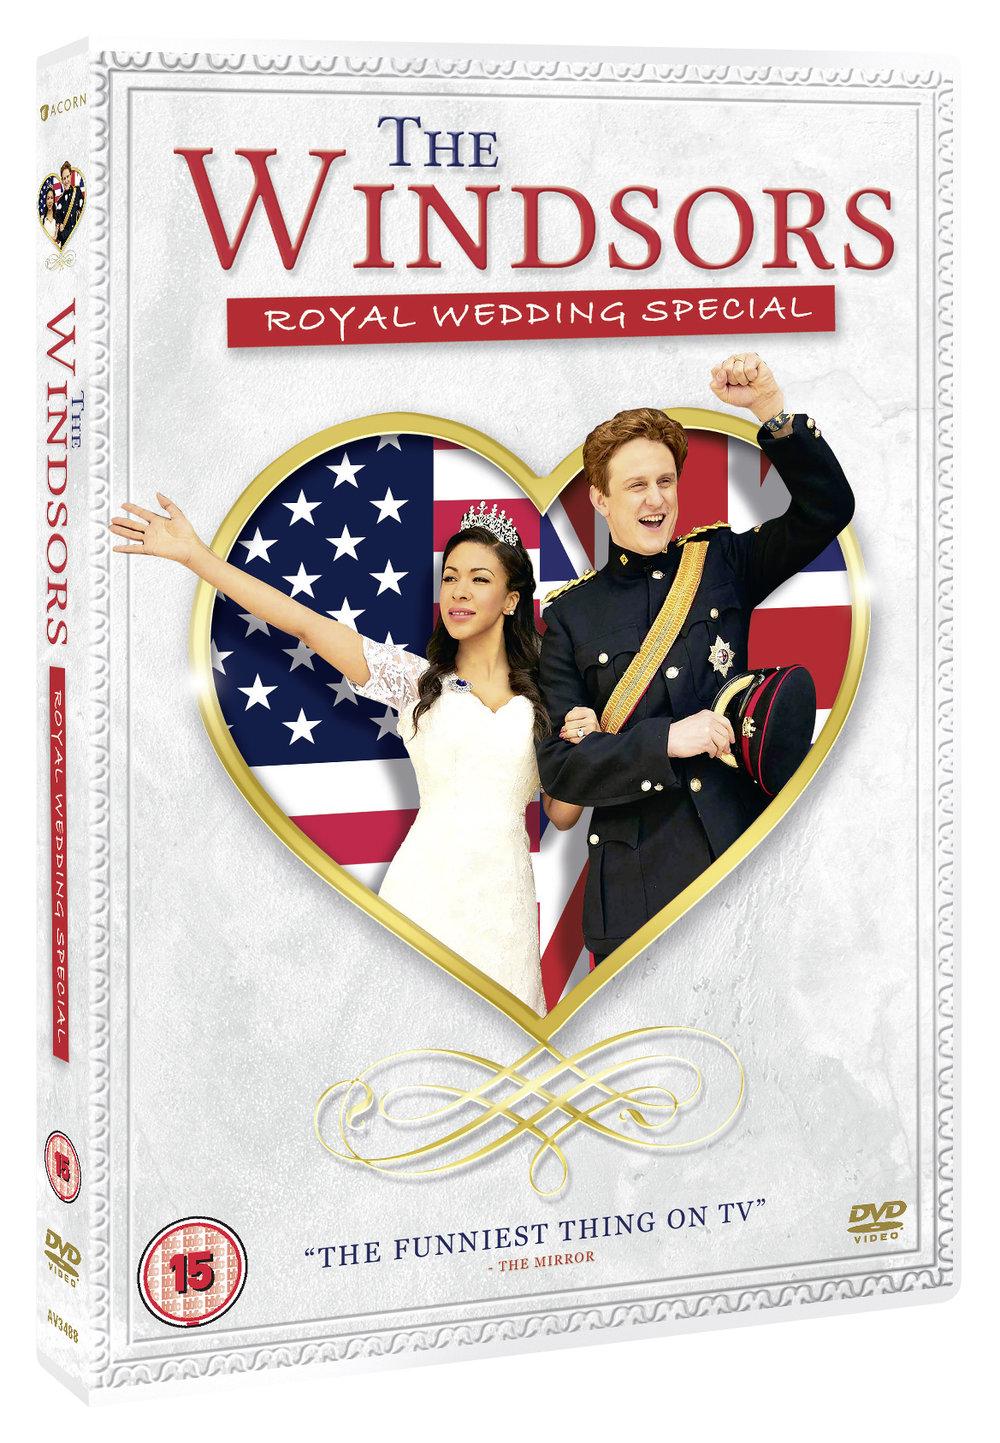 TheWindsors_RoyalWeddingSpecial_DVD_3D.jpg